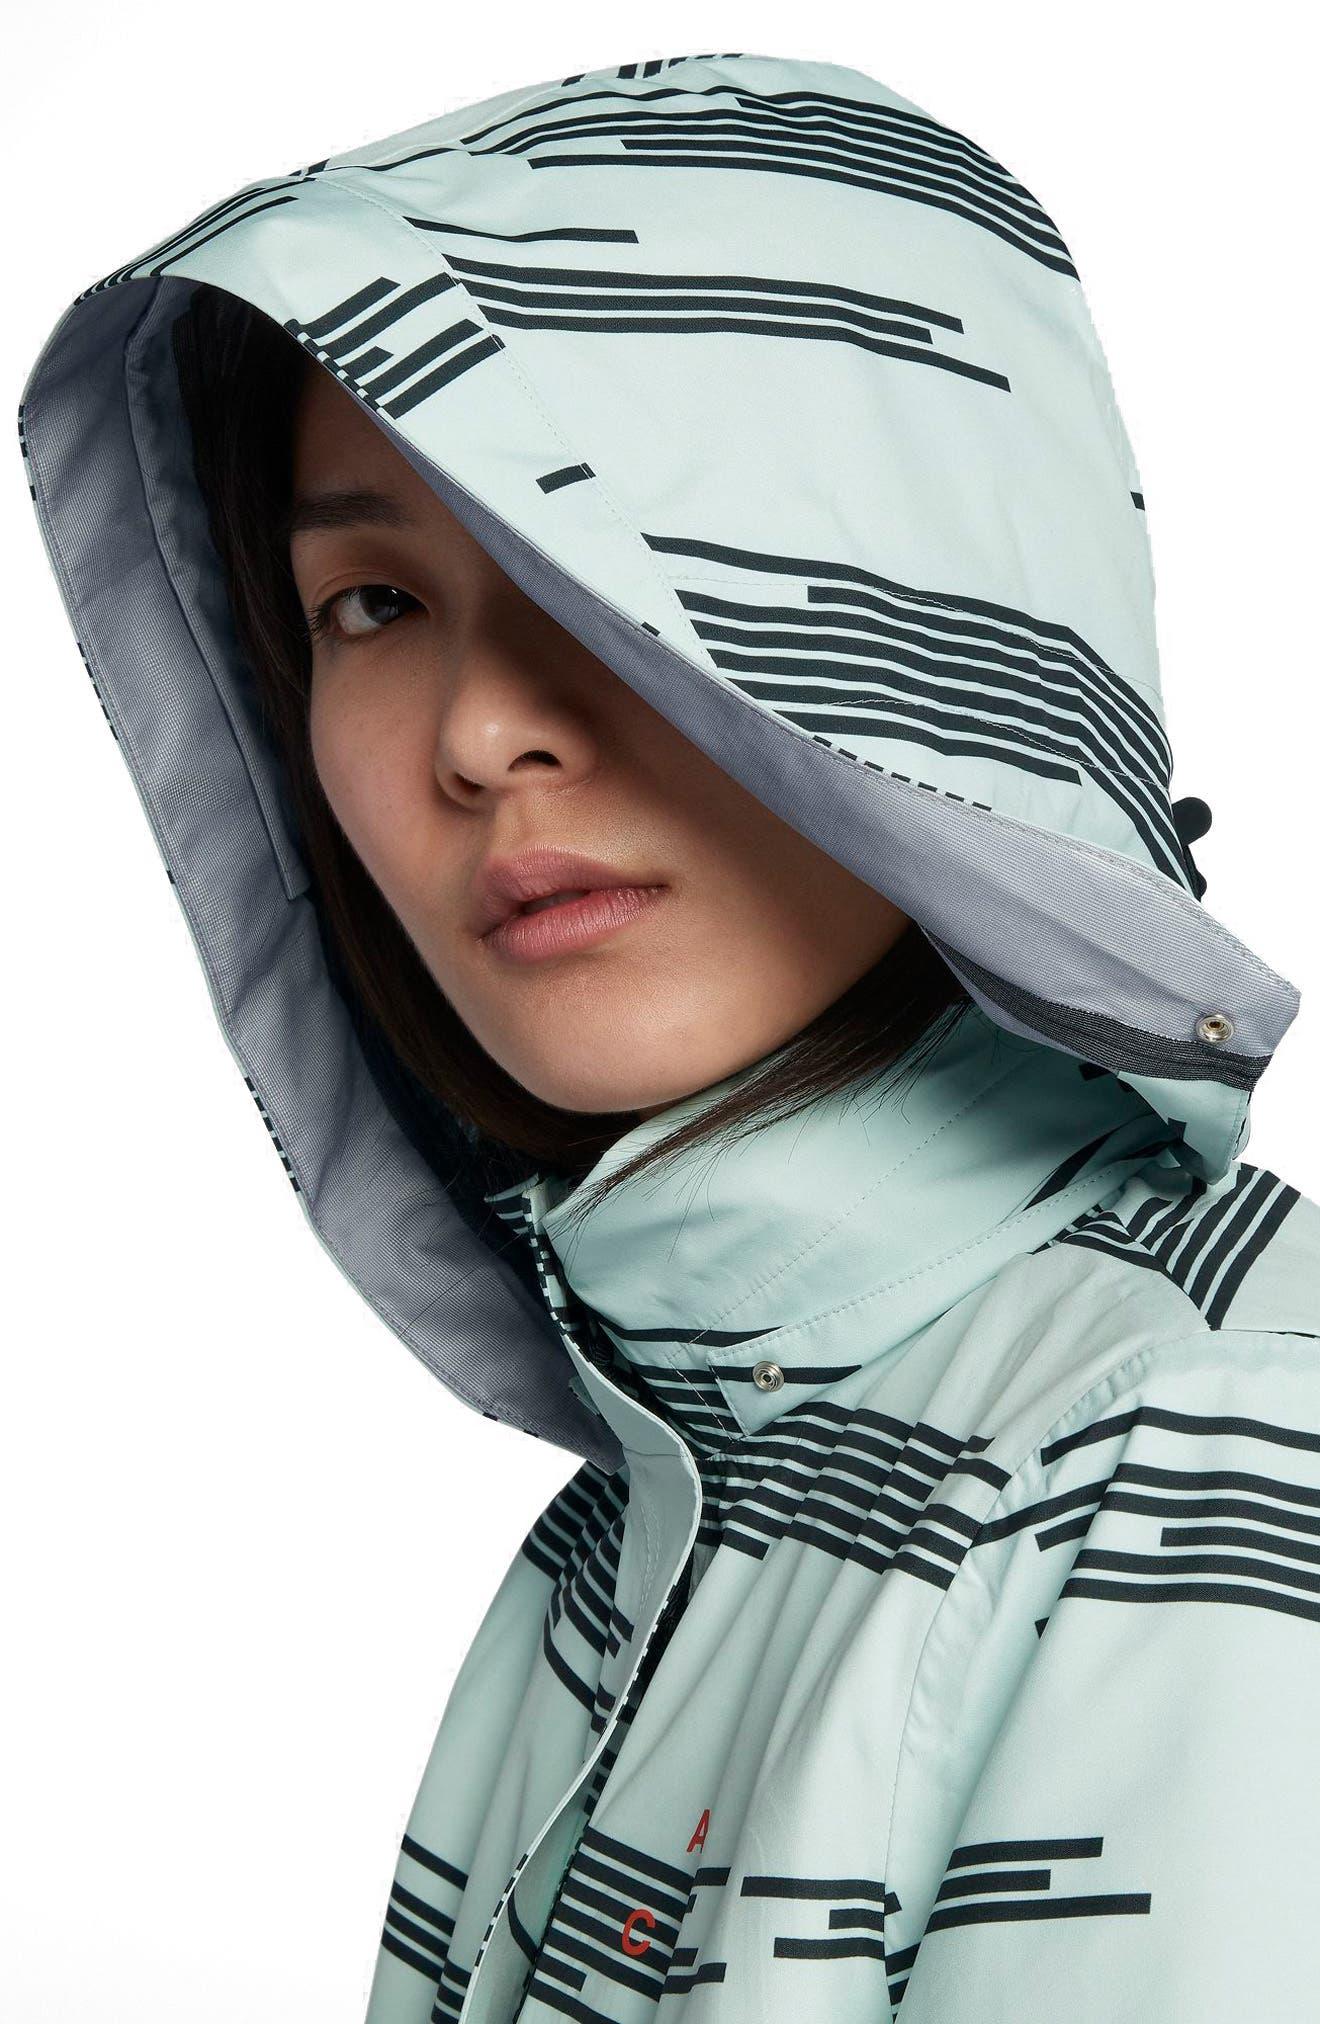 NikeLab ACG 3-in-1 System Women's Coat,                             Alternate thumbnail 5, color,                             Barely Green/ Black